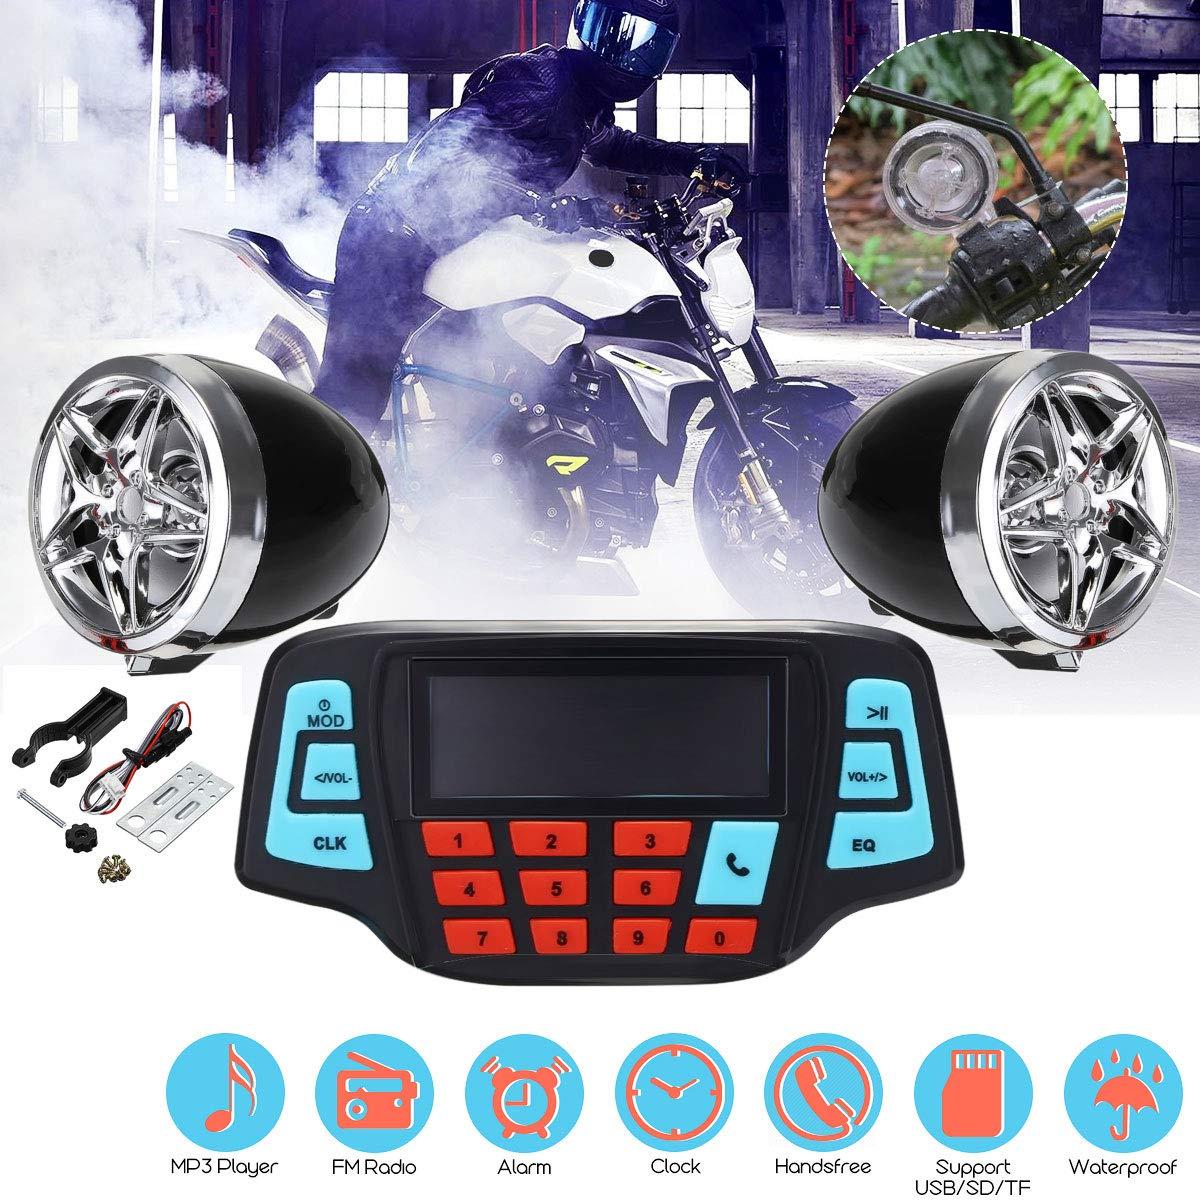 Amazon.com: HERIUS - Altavoces estéreo para motocicleta ...